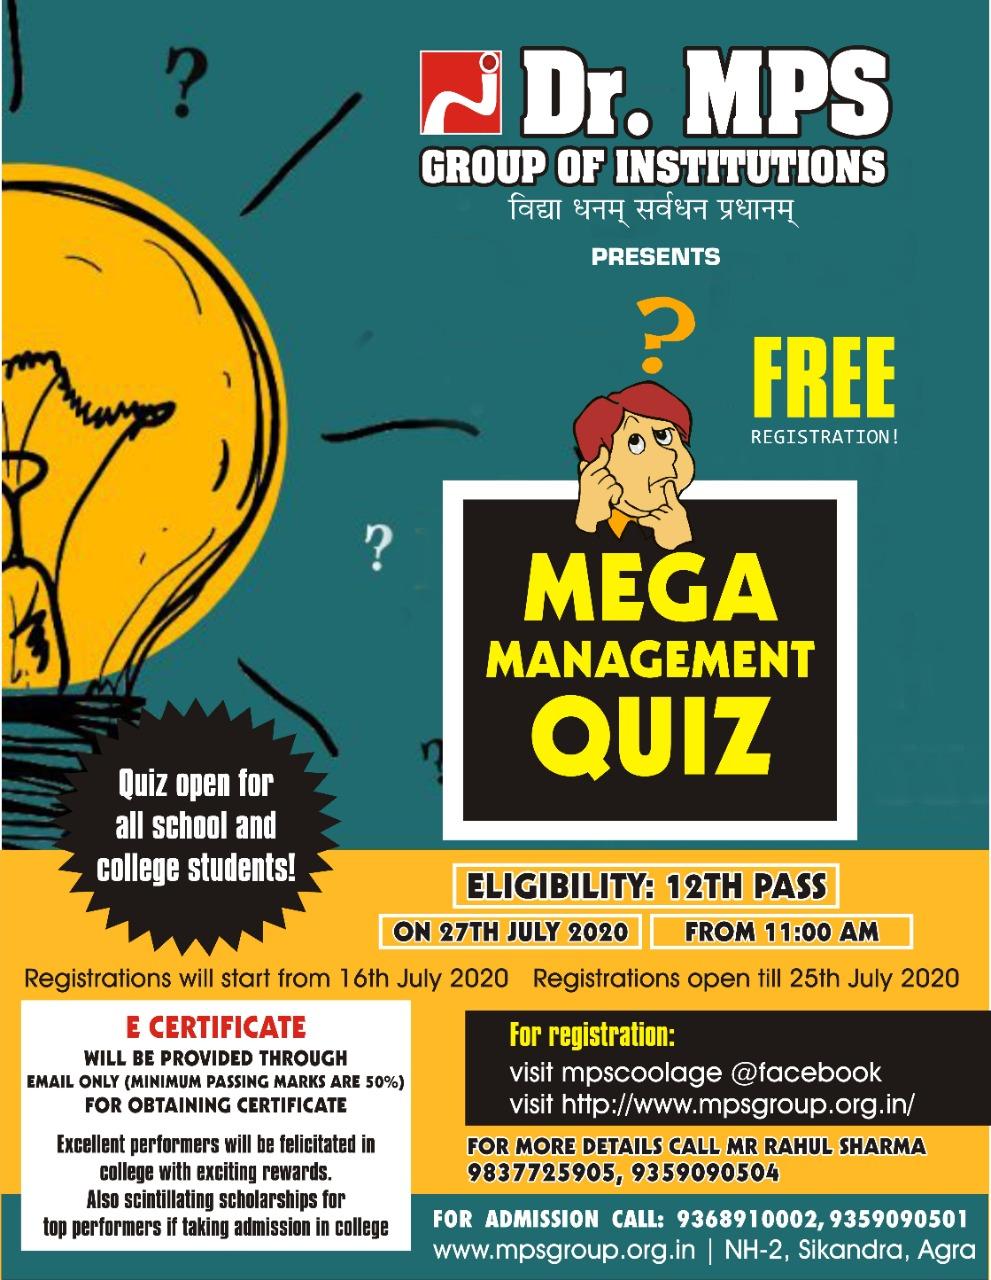 Mega Management Quiz